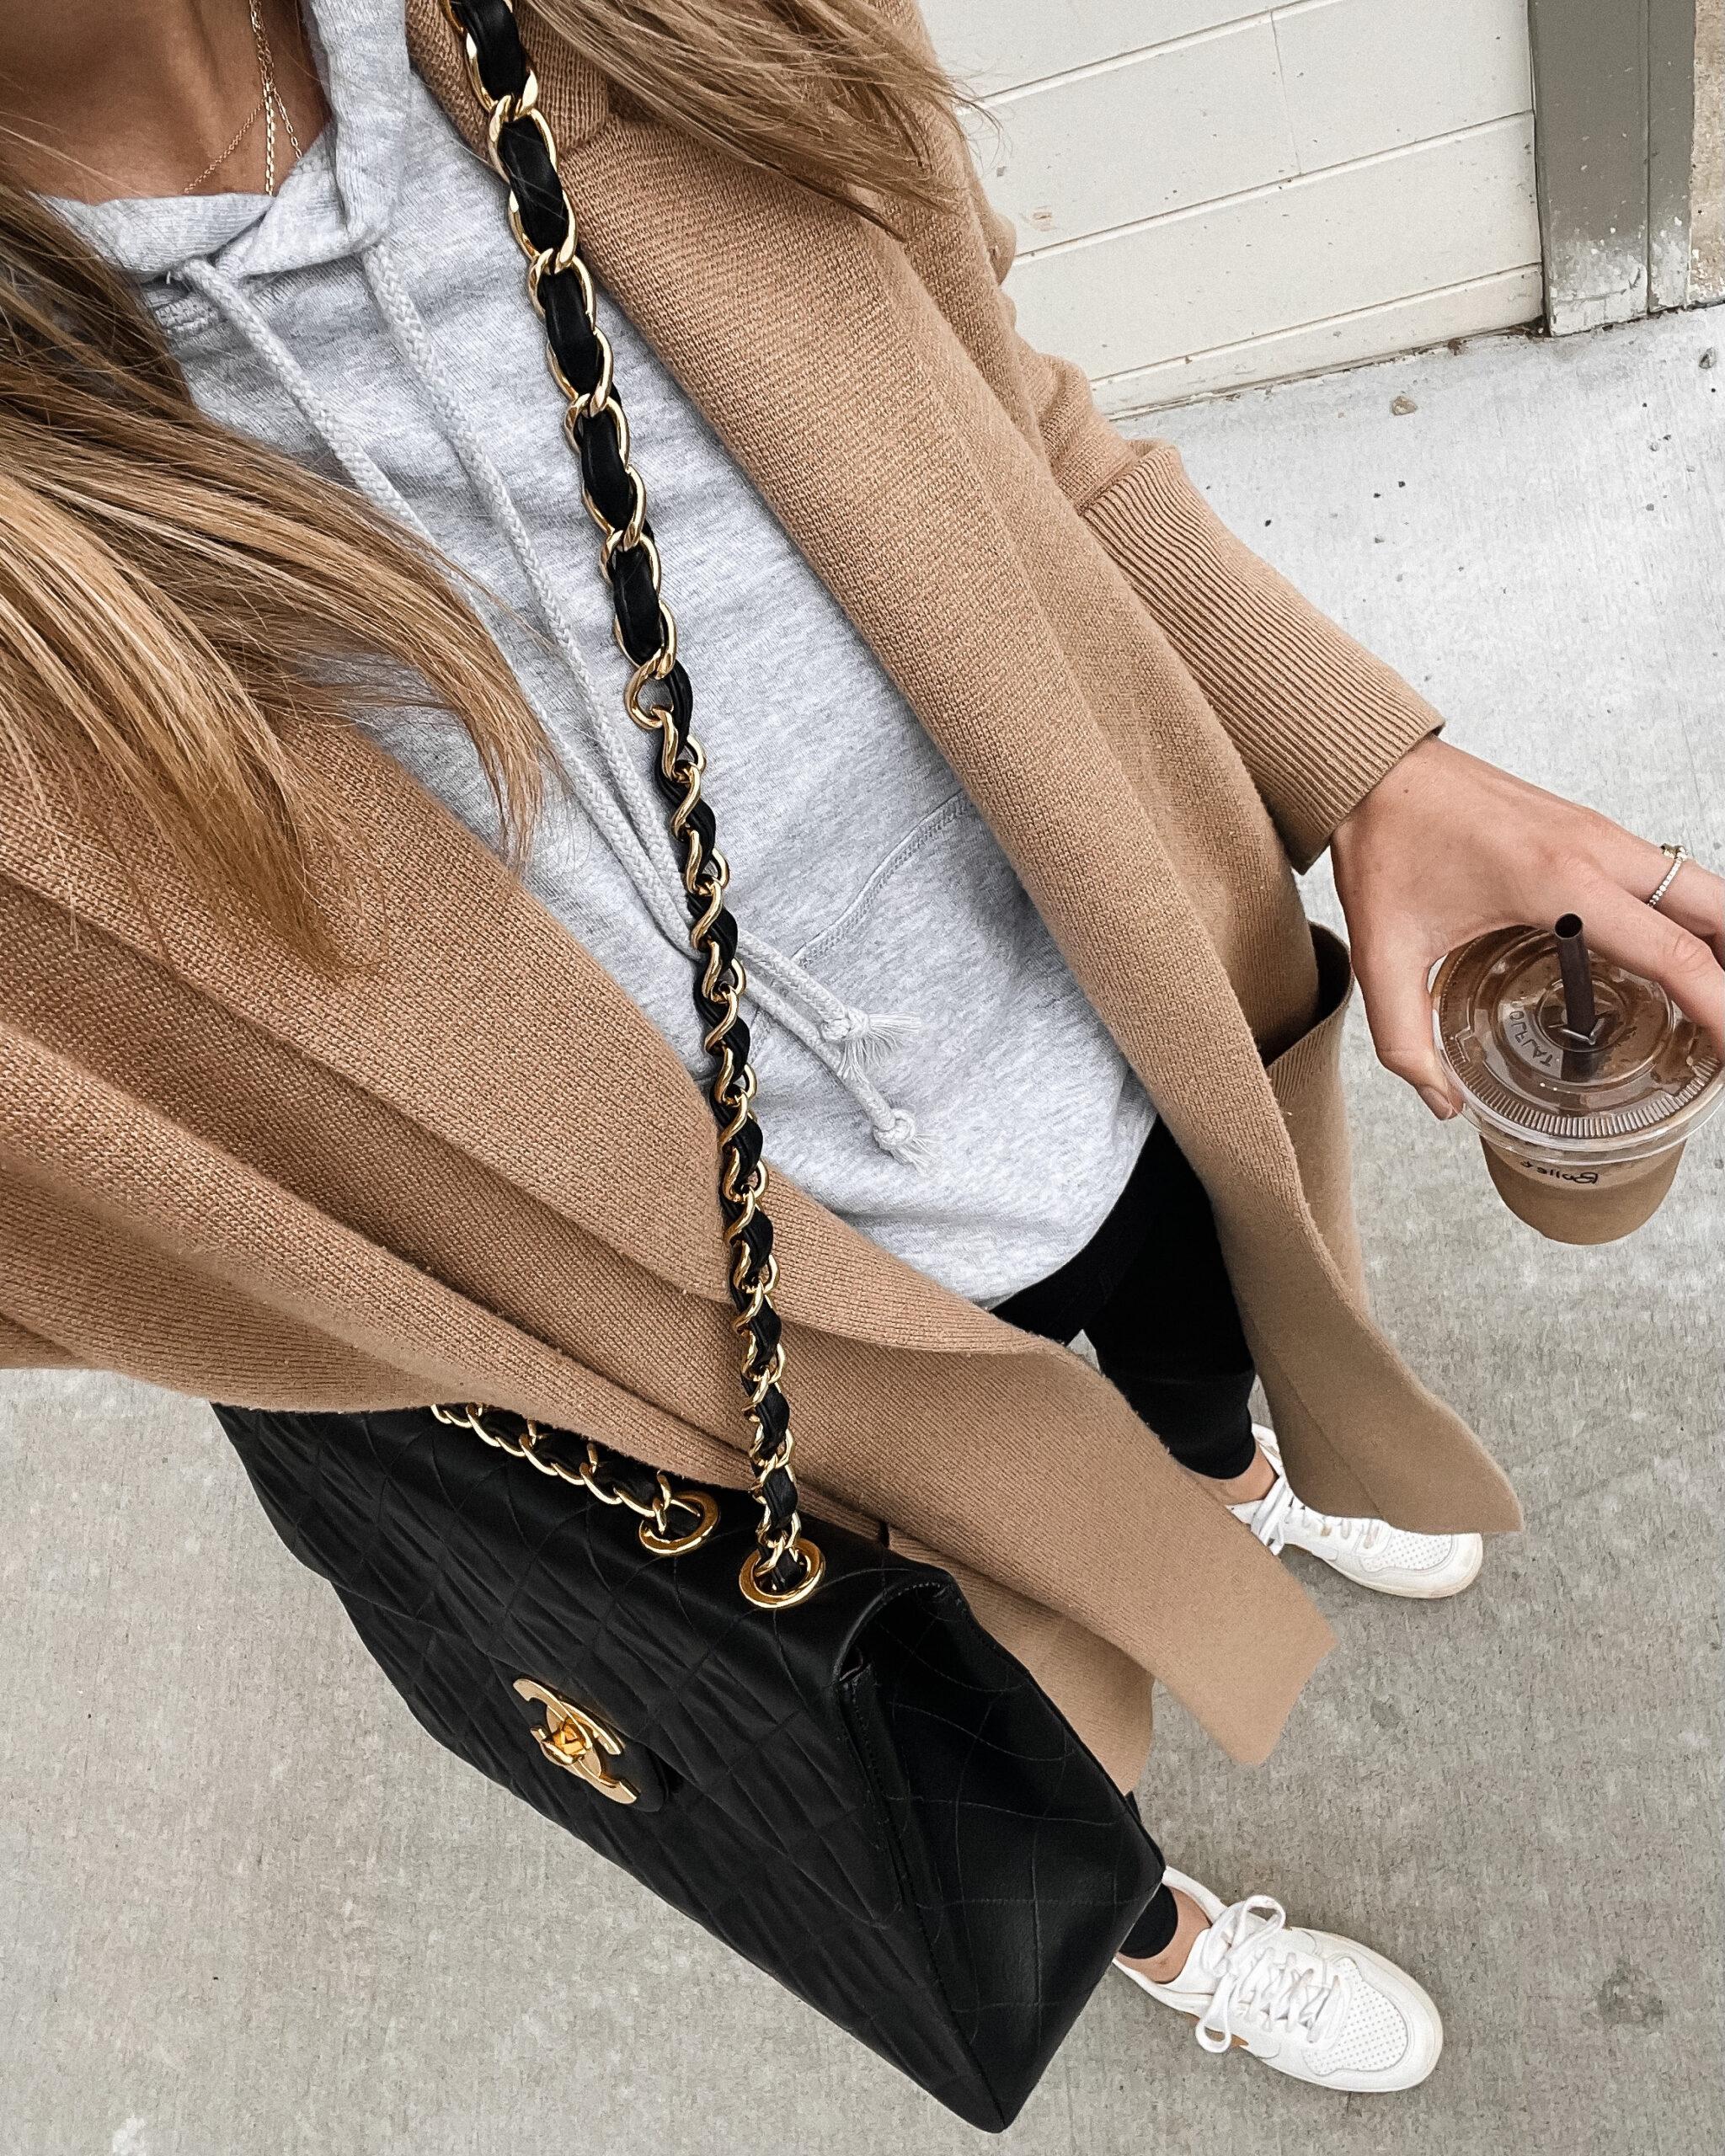 Fashion Jackson Wearing Camel Coatigan Grey Hoodie Sweatshirt Black Leggings Veja Sneakers Chanel Handbag